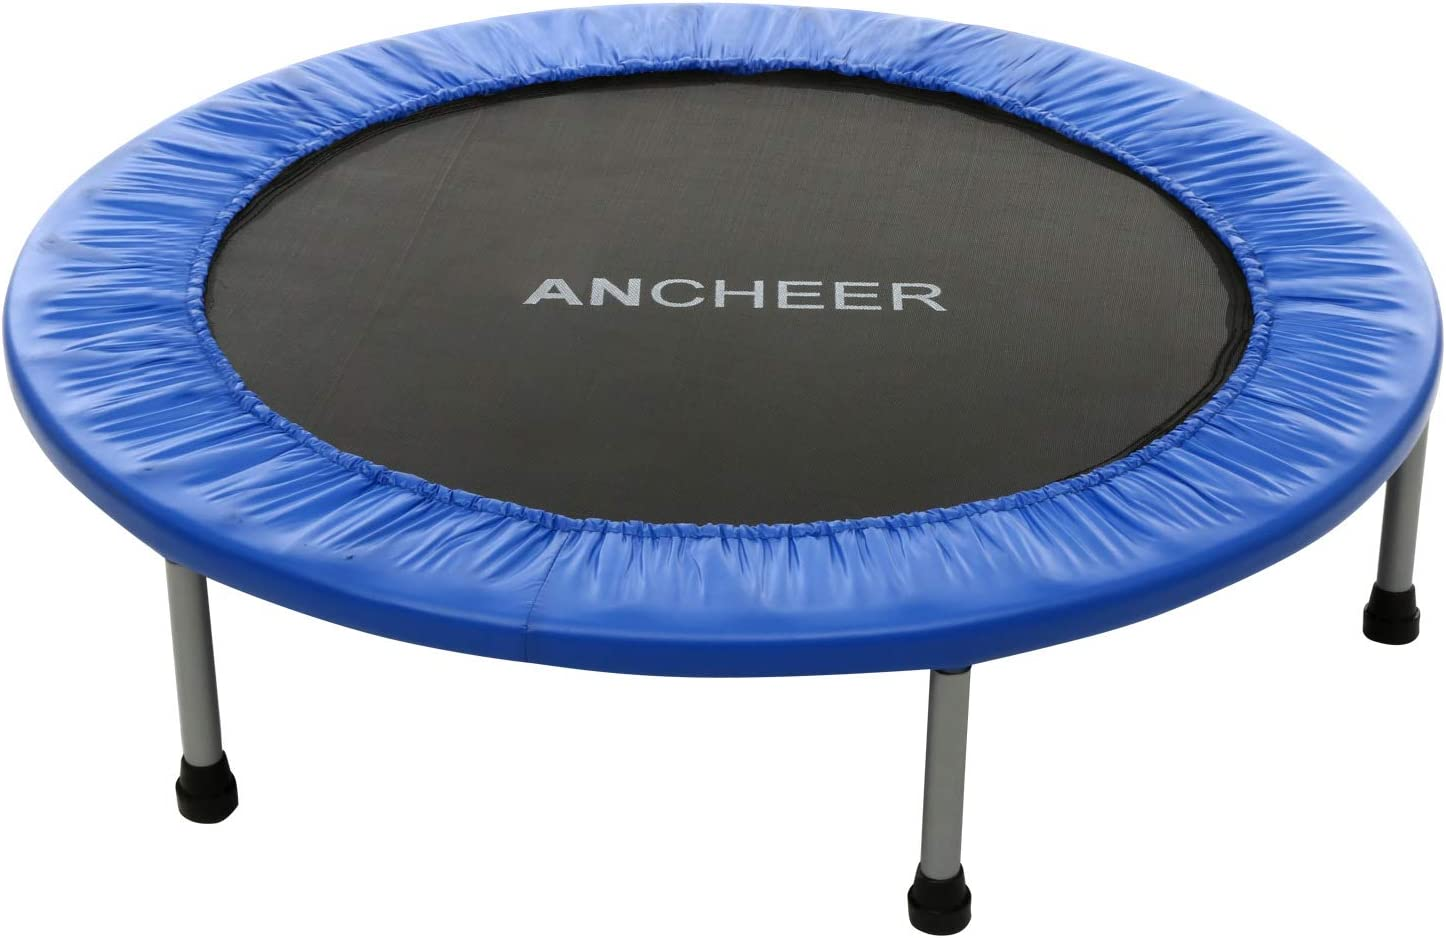 ANCHEER Trampoline